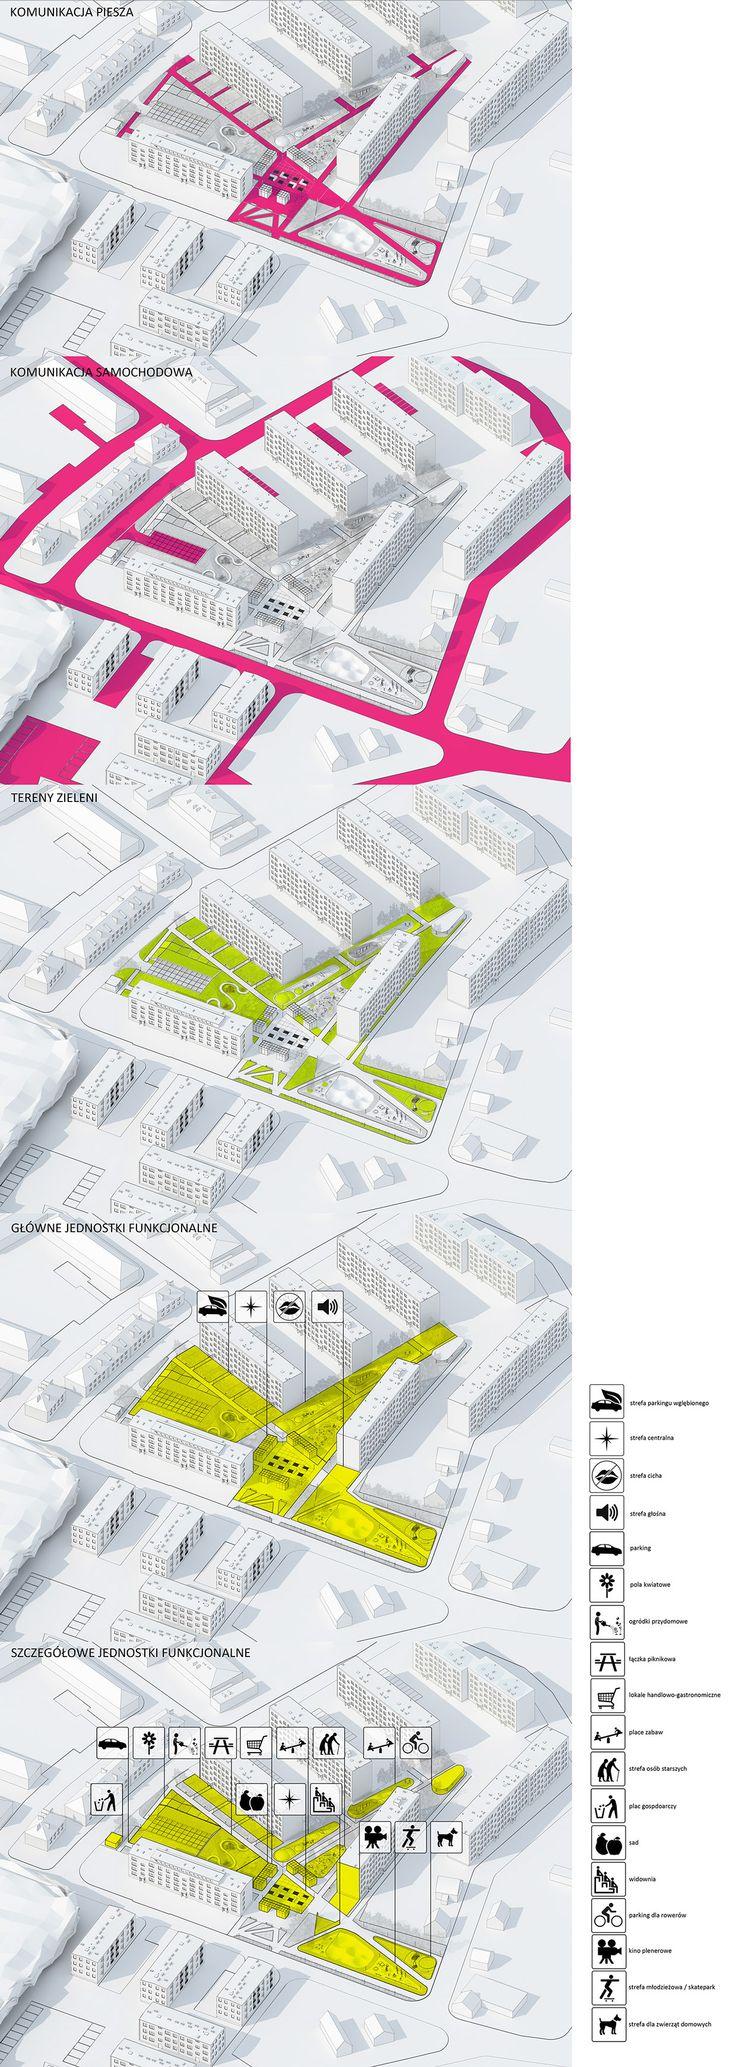 Square redevelopment in Kuznia Raciborska on Behance